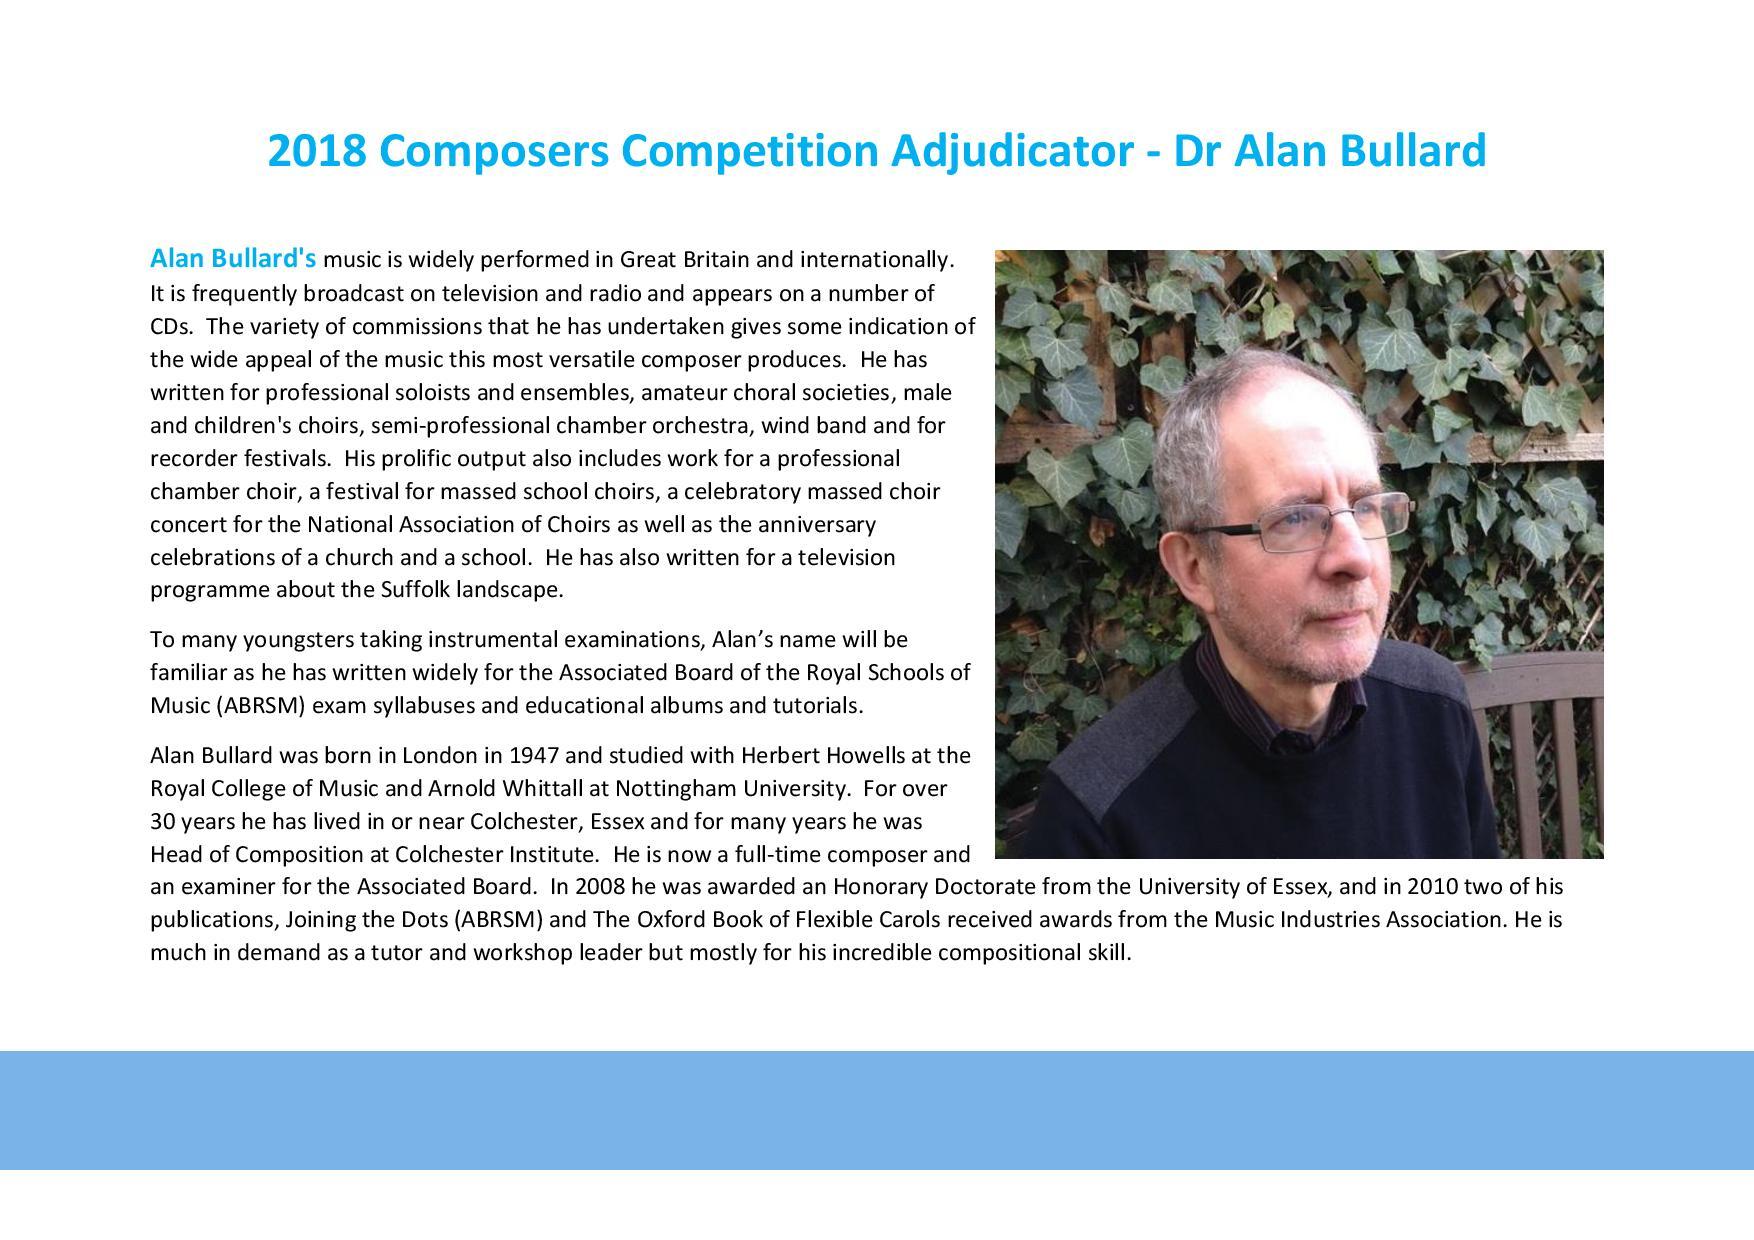 Dr Alan Bullard bio 2018-page-001.jpg